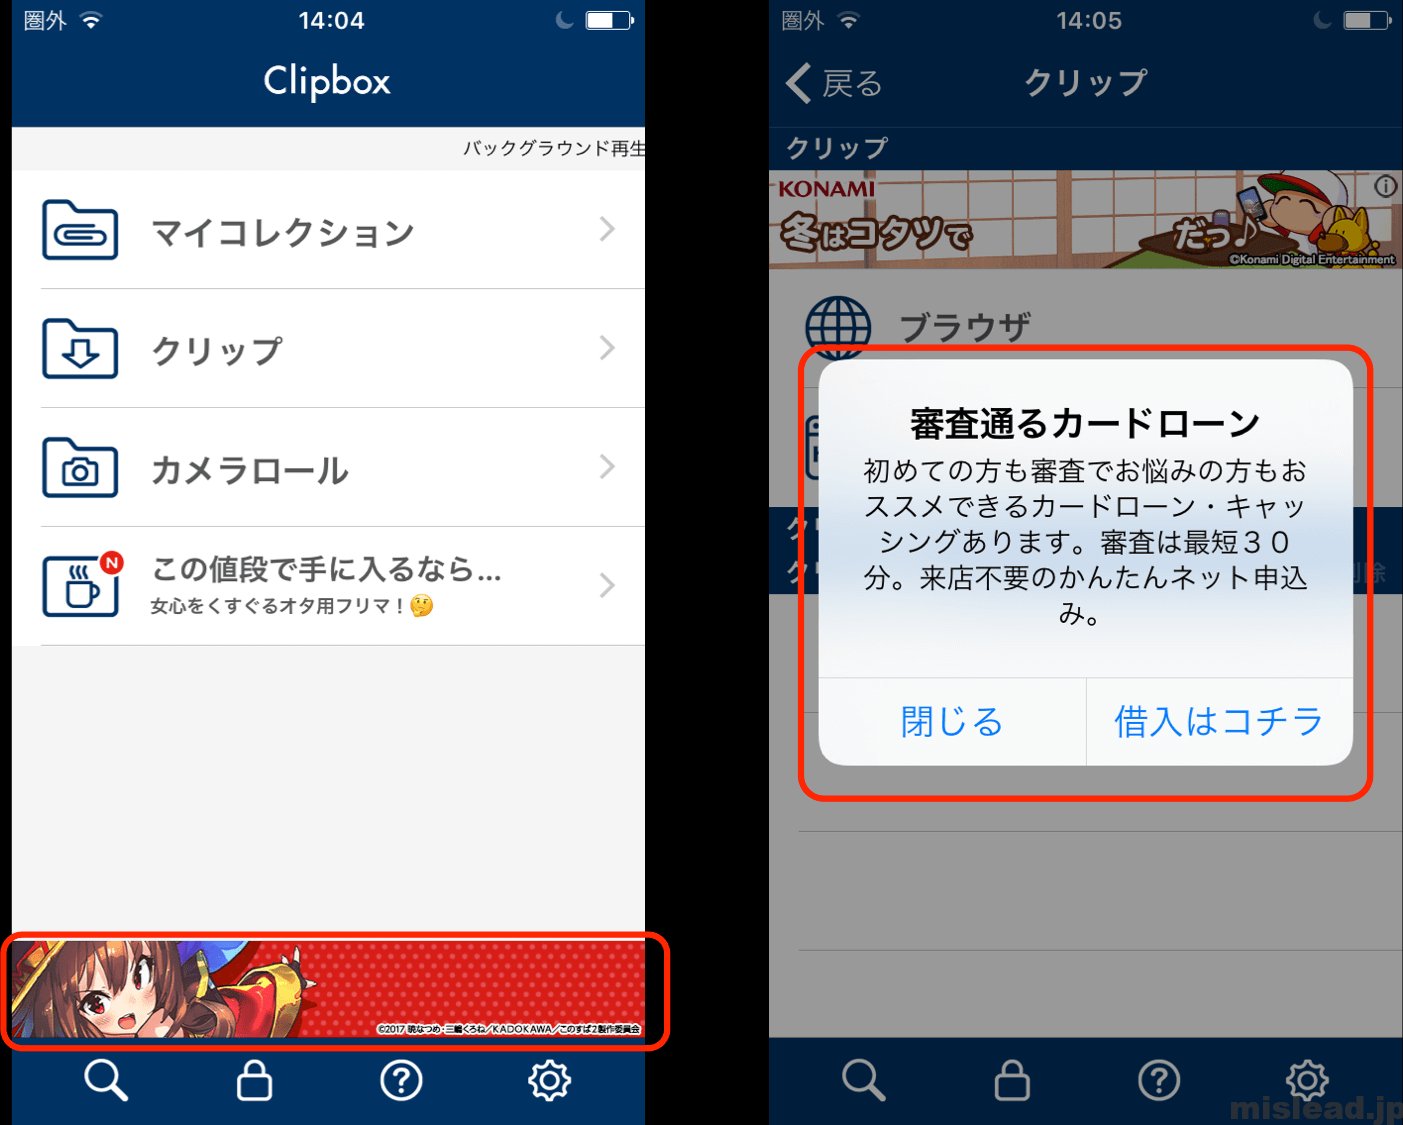 Clipboxの収益は広告収入